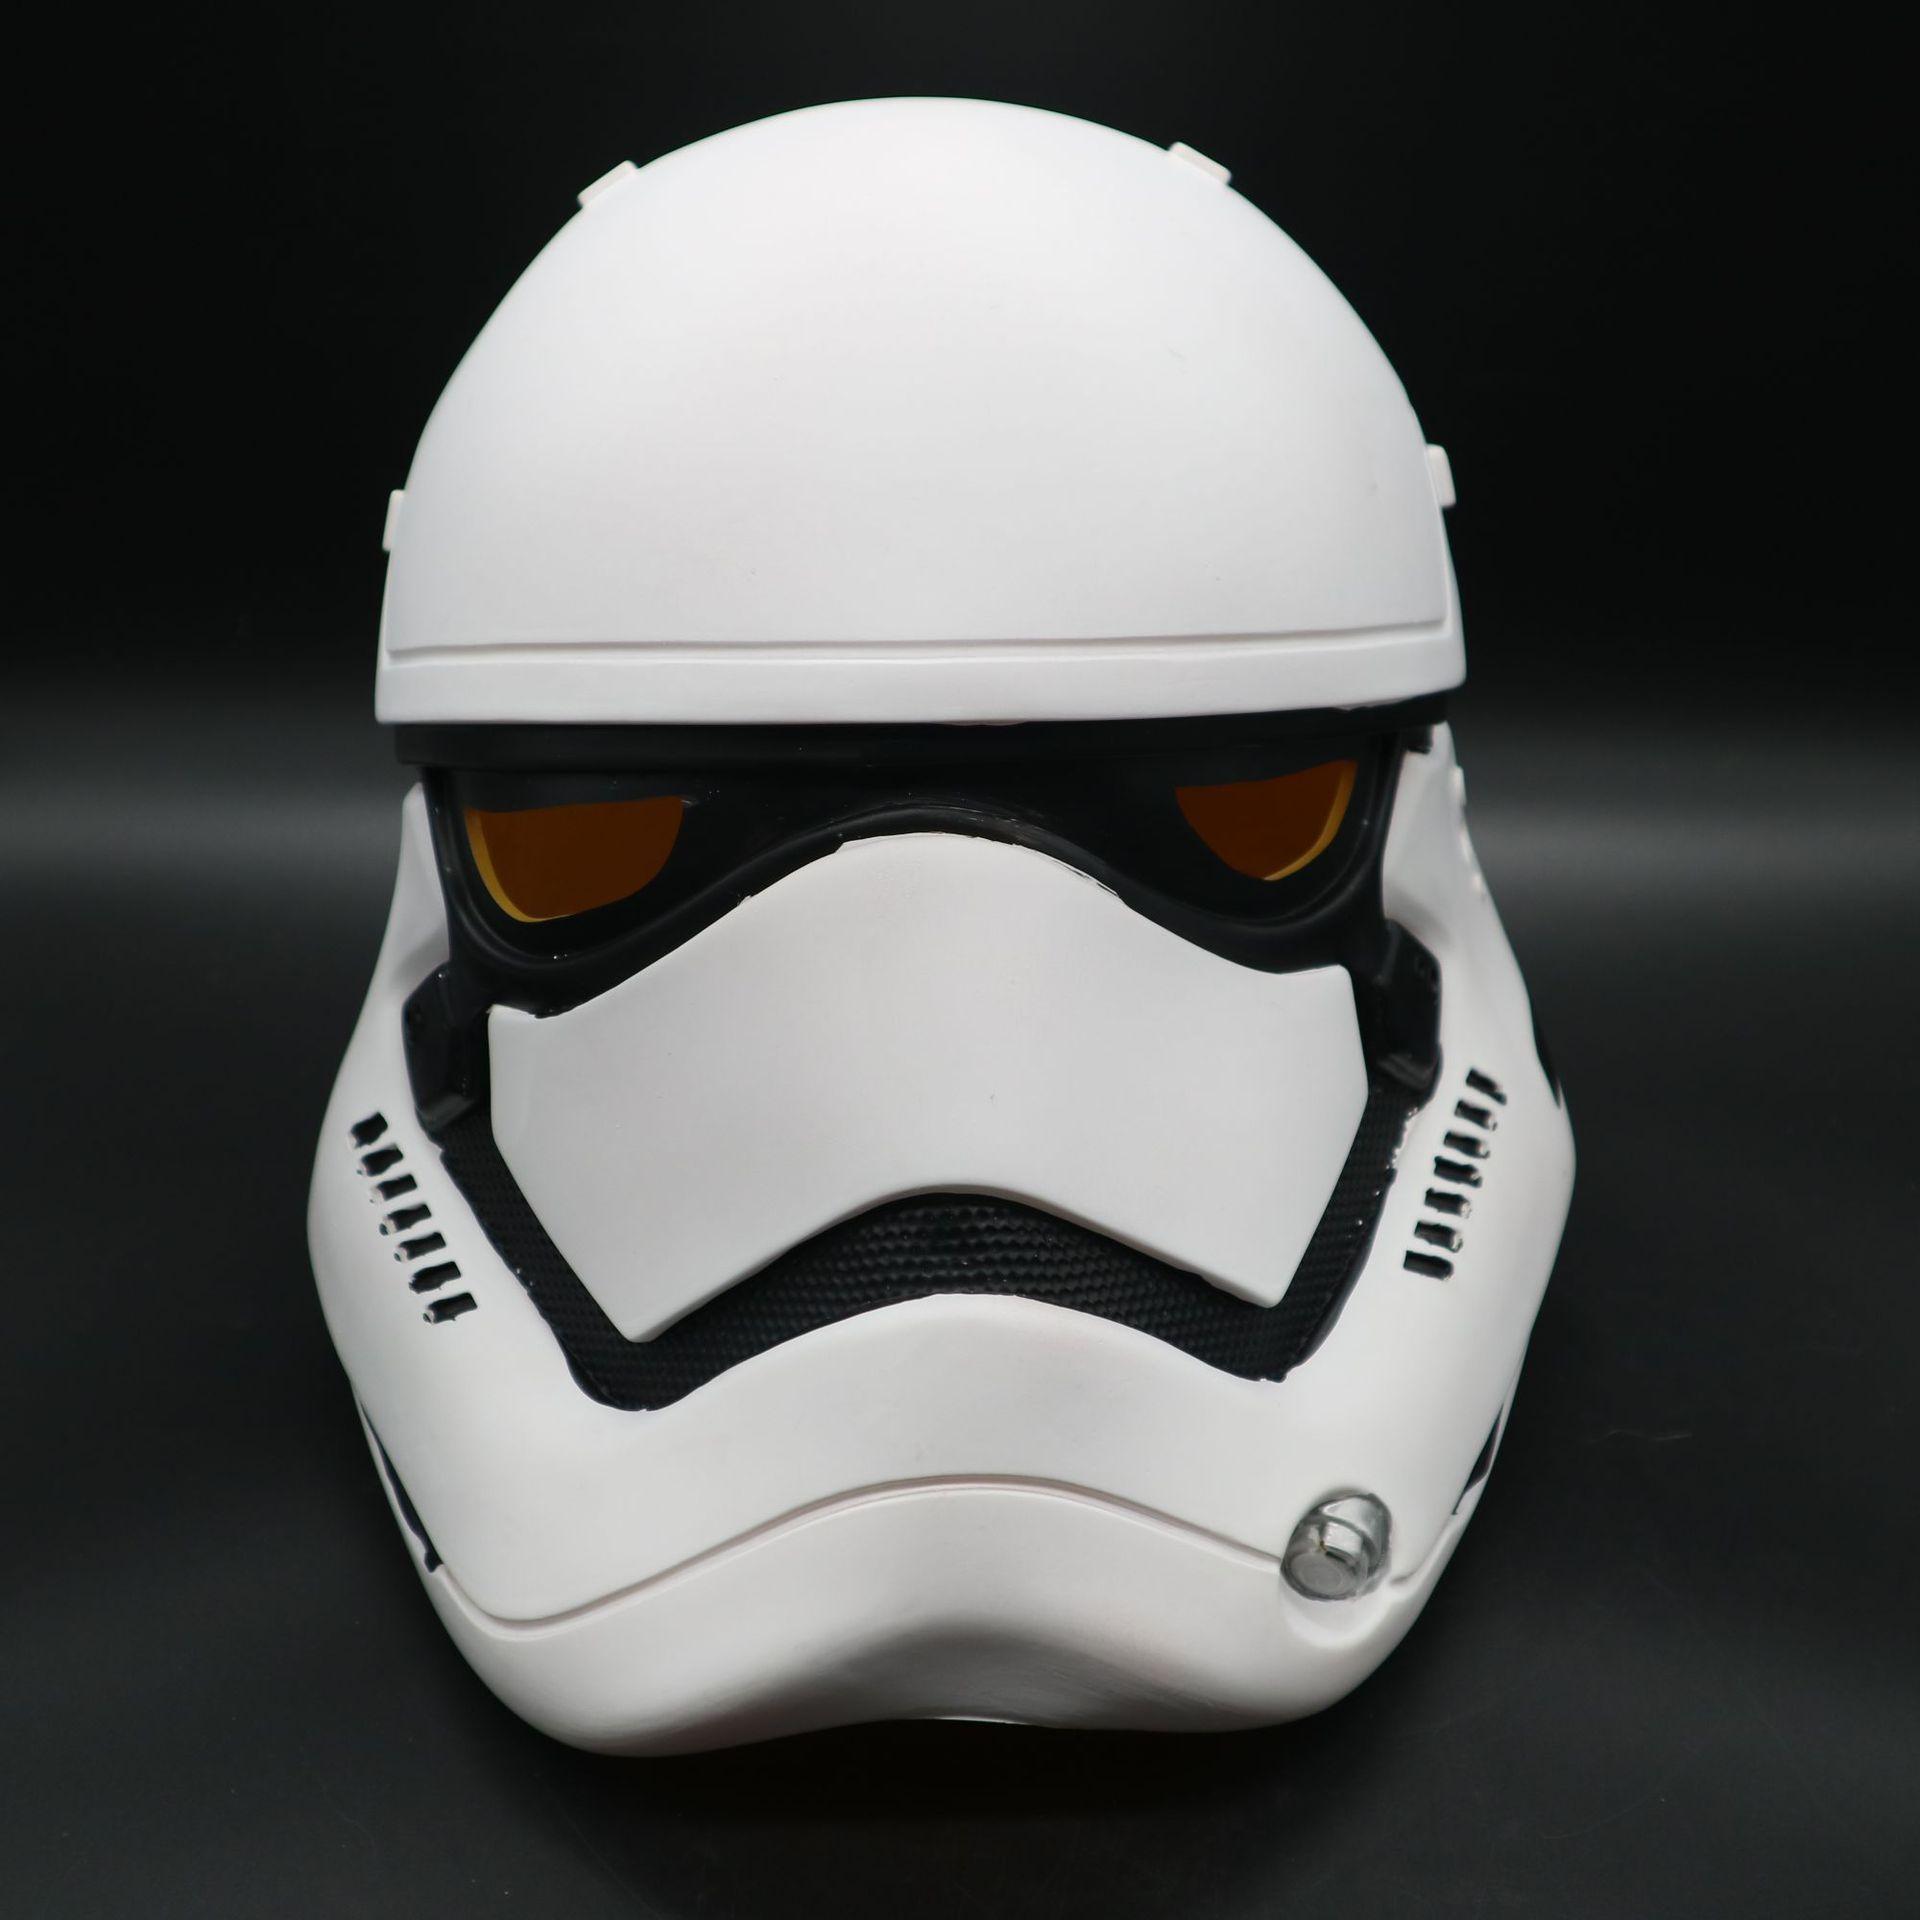 star wars CLONE TROOPER MASK helmet TOY cosplay dress up HAS SOUNDS kids 95D